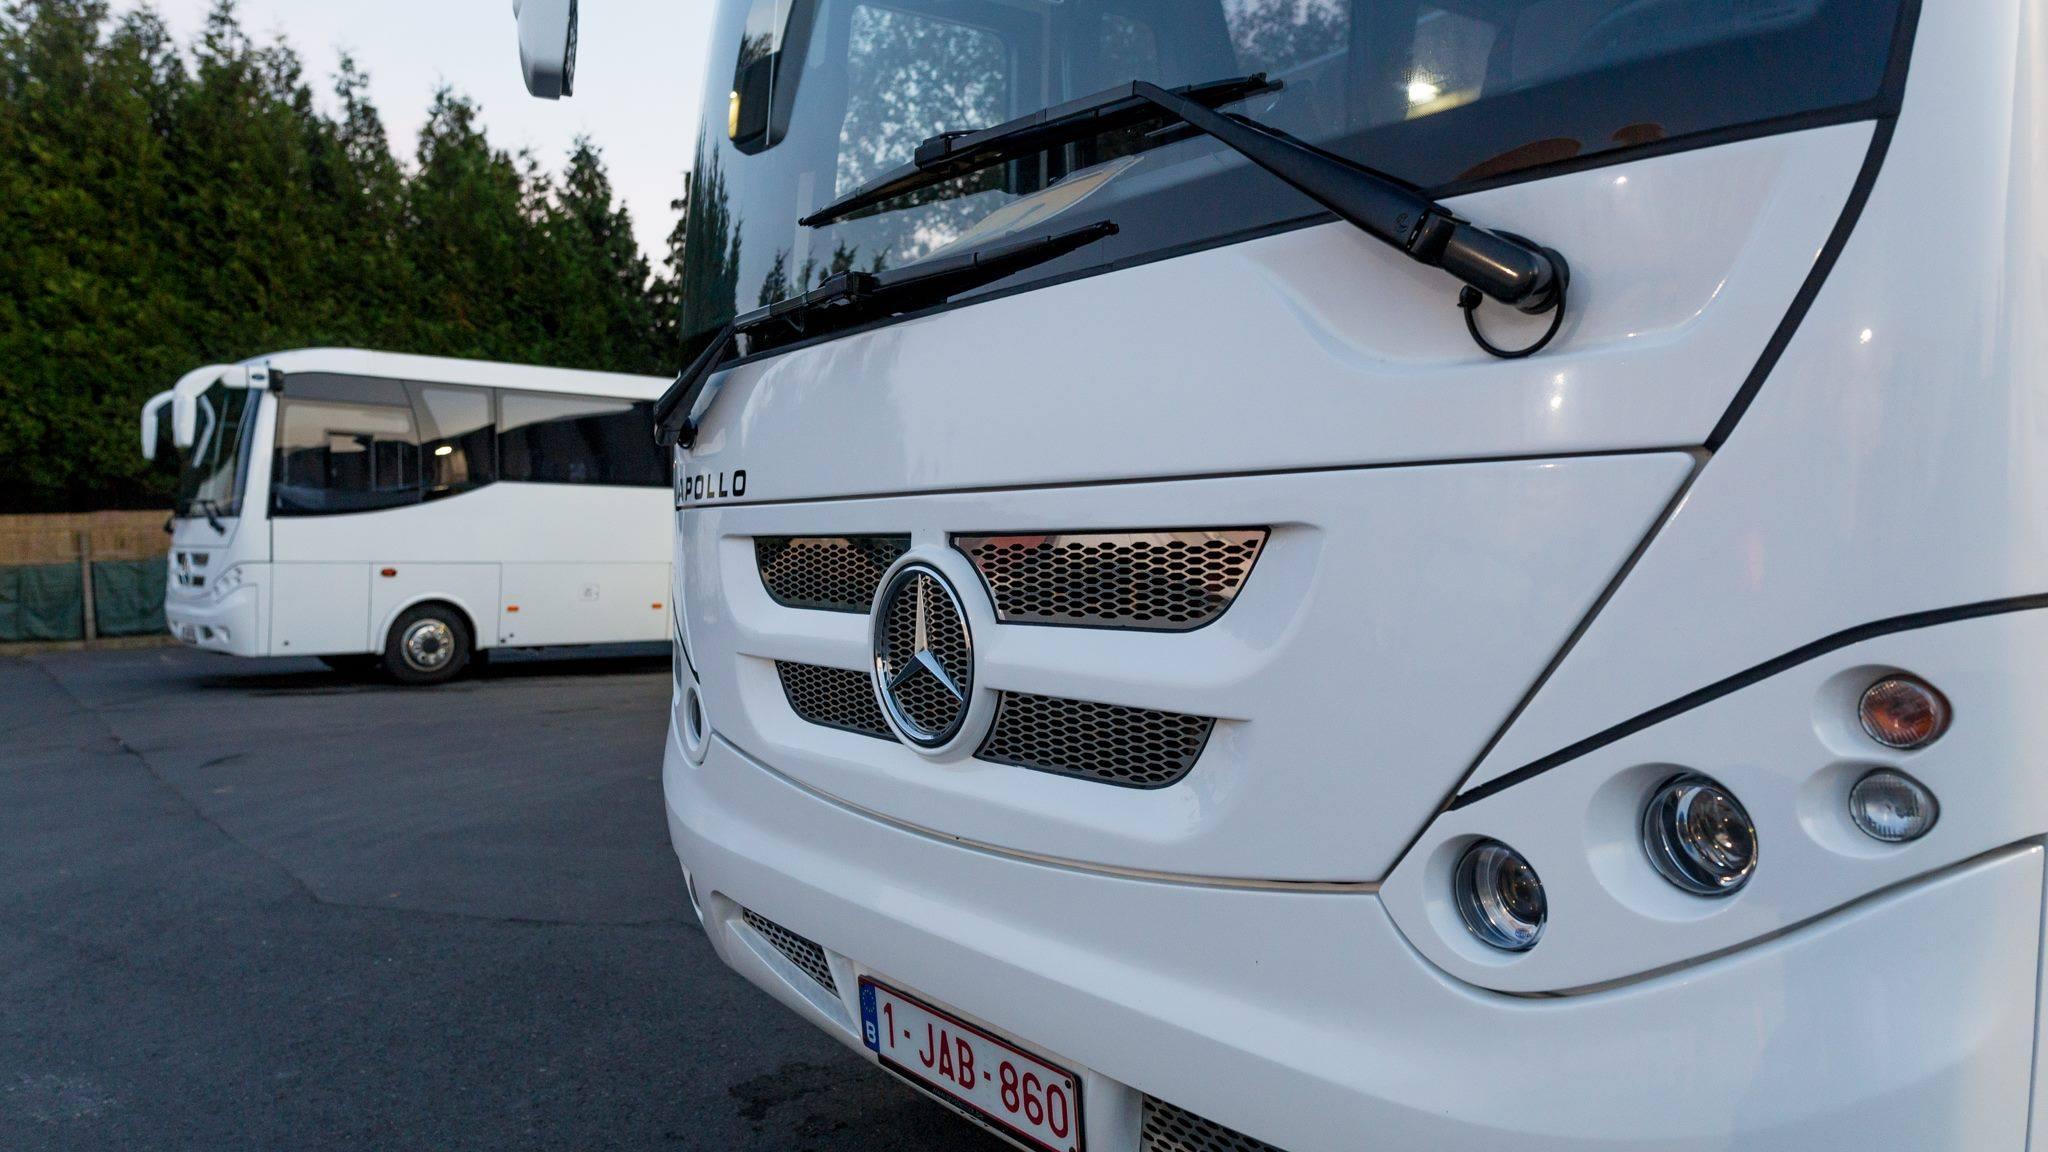 Starbus.jpg